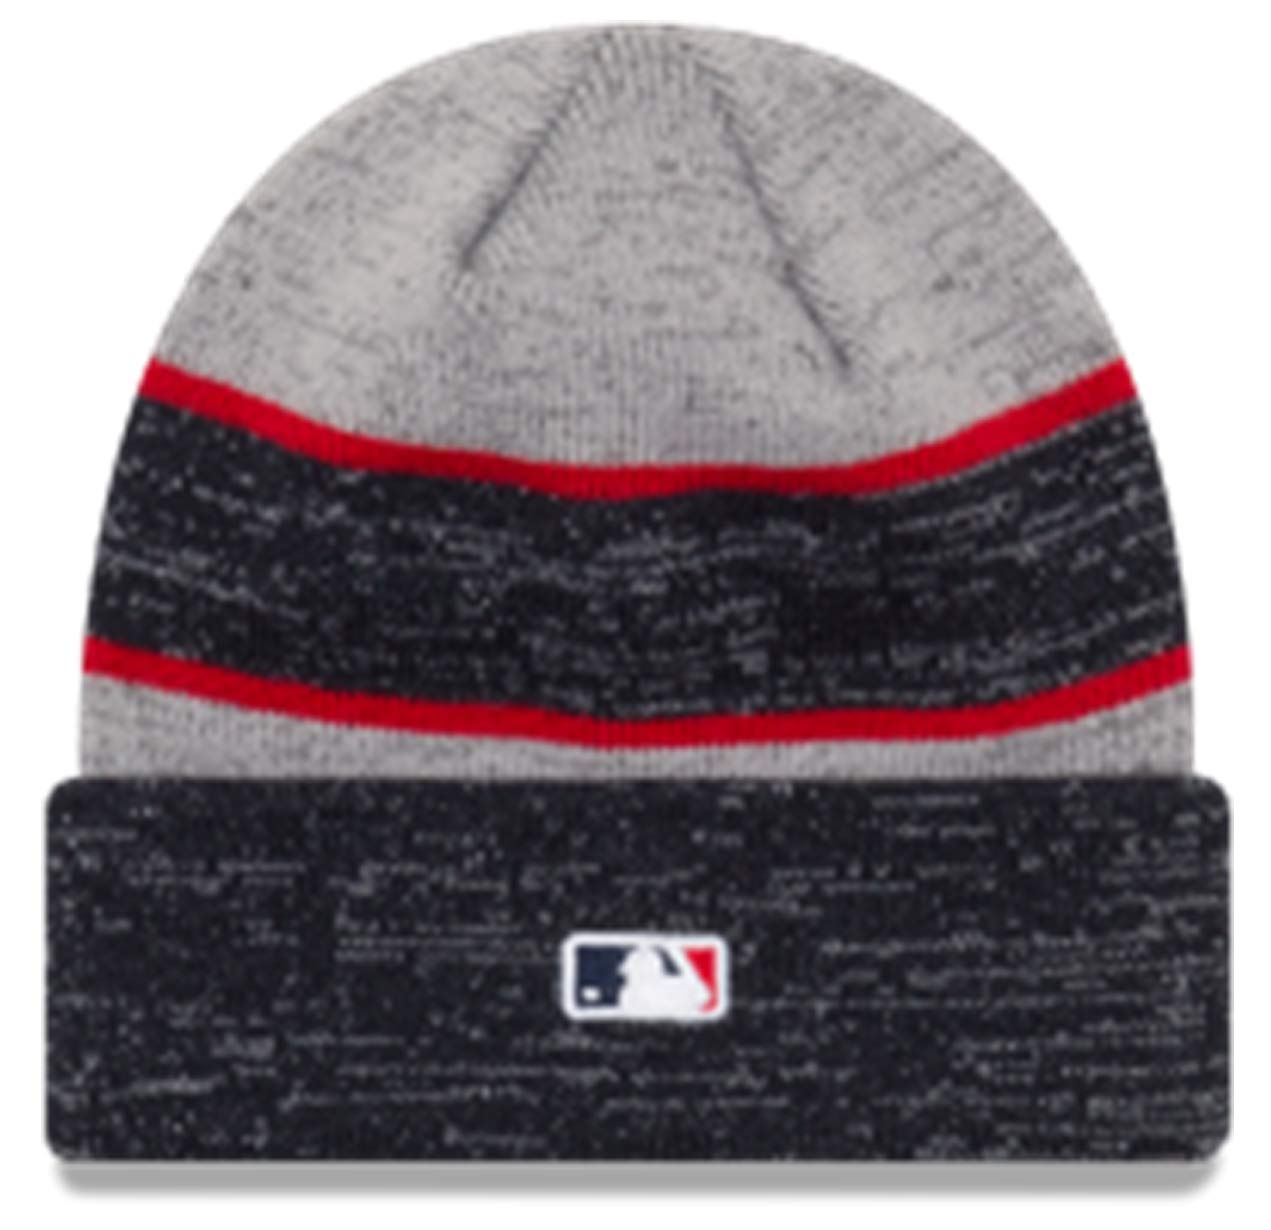 b4baeb9ed74 Amazon.com  New Era Authentic Atlanta Braves 2017-18 Cuff Sport Knit MLB  Onfield Sideline Beanie Unisex Hat Gray Navy